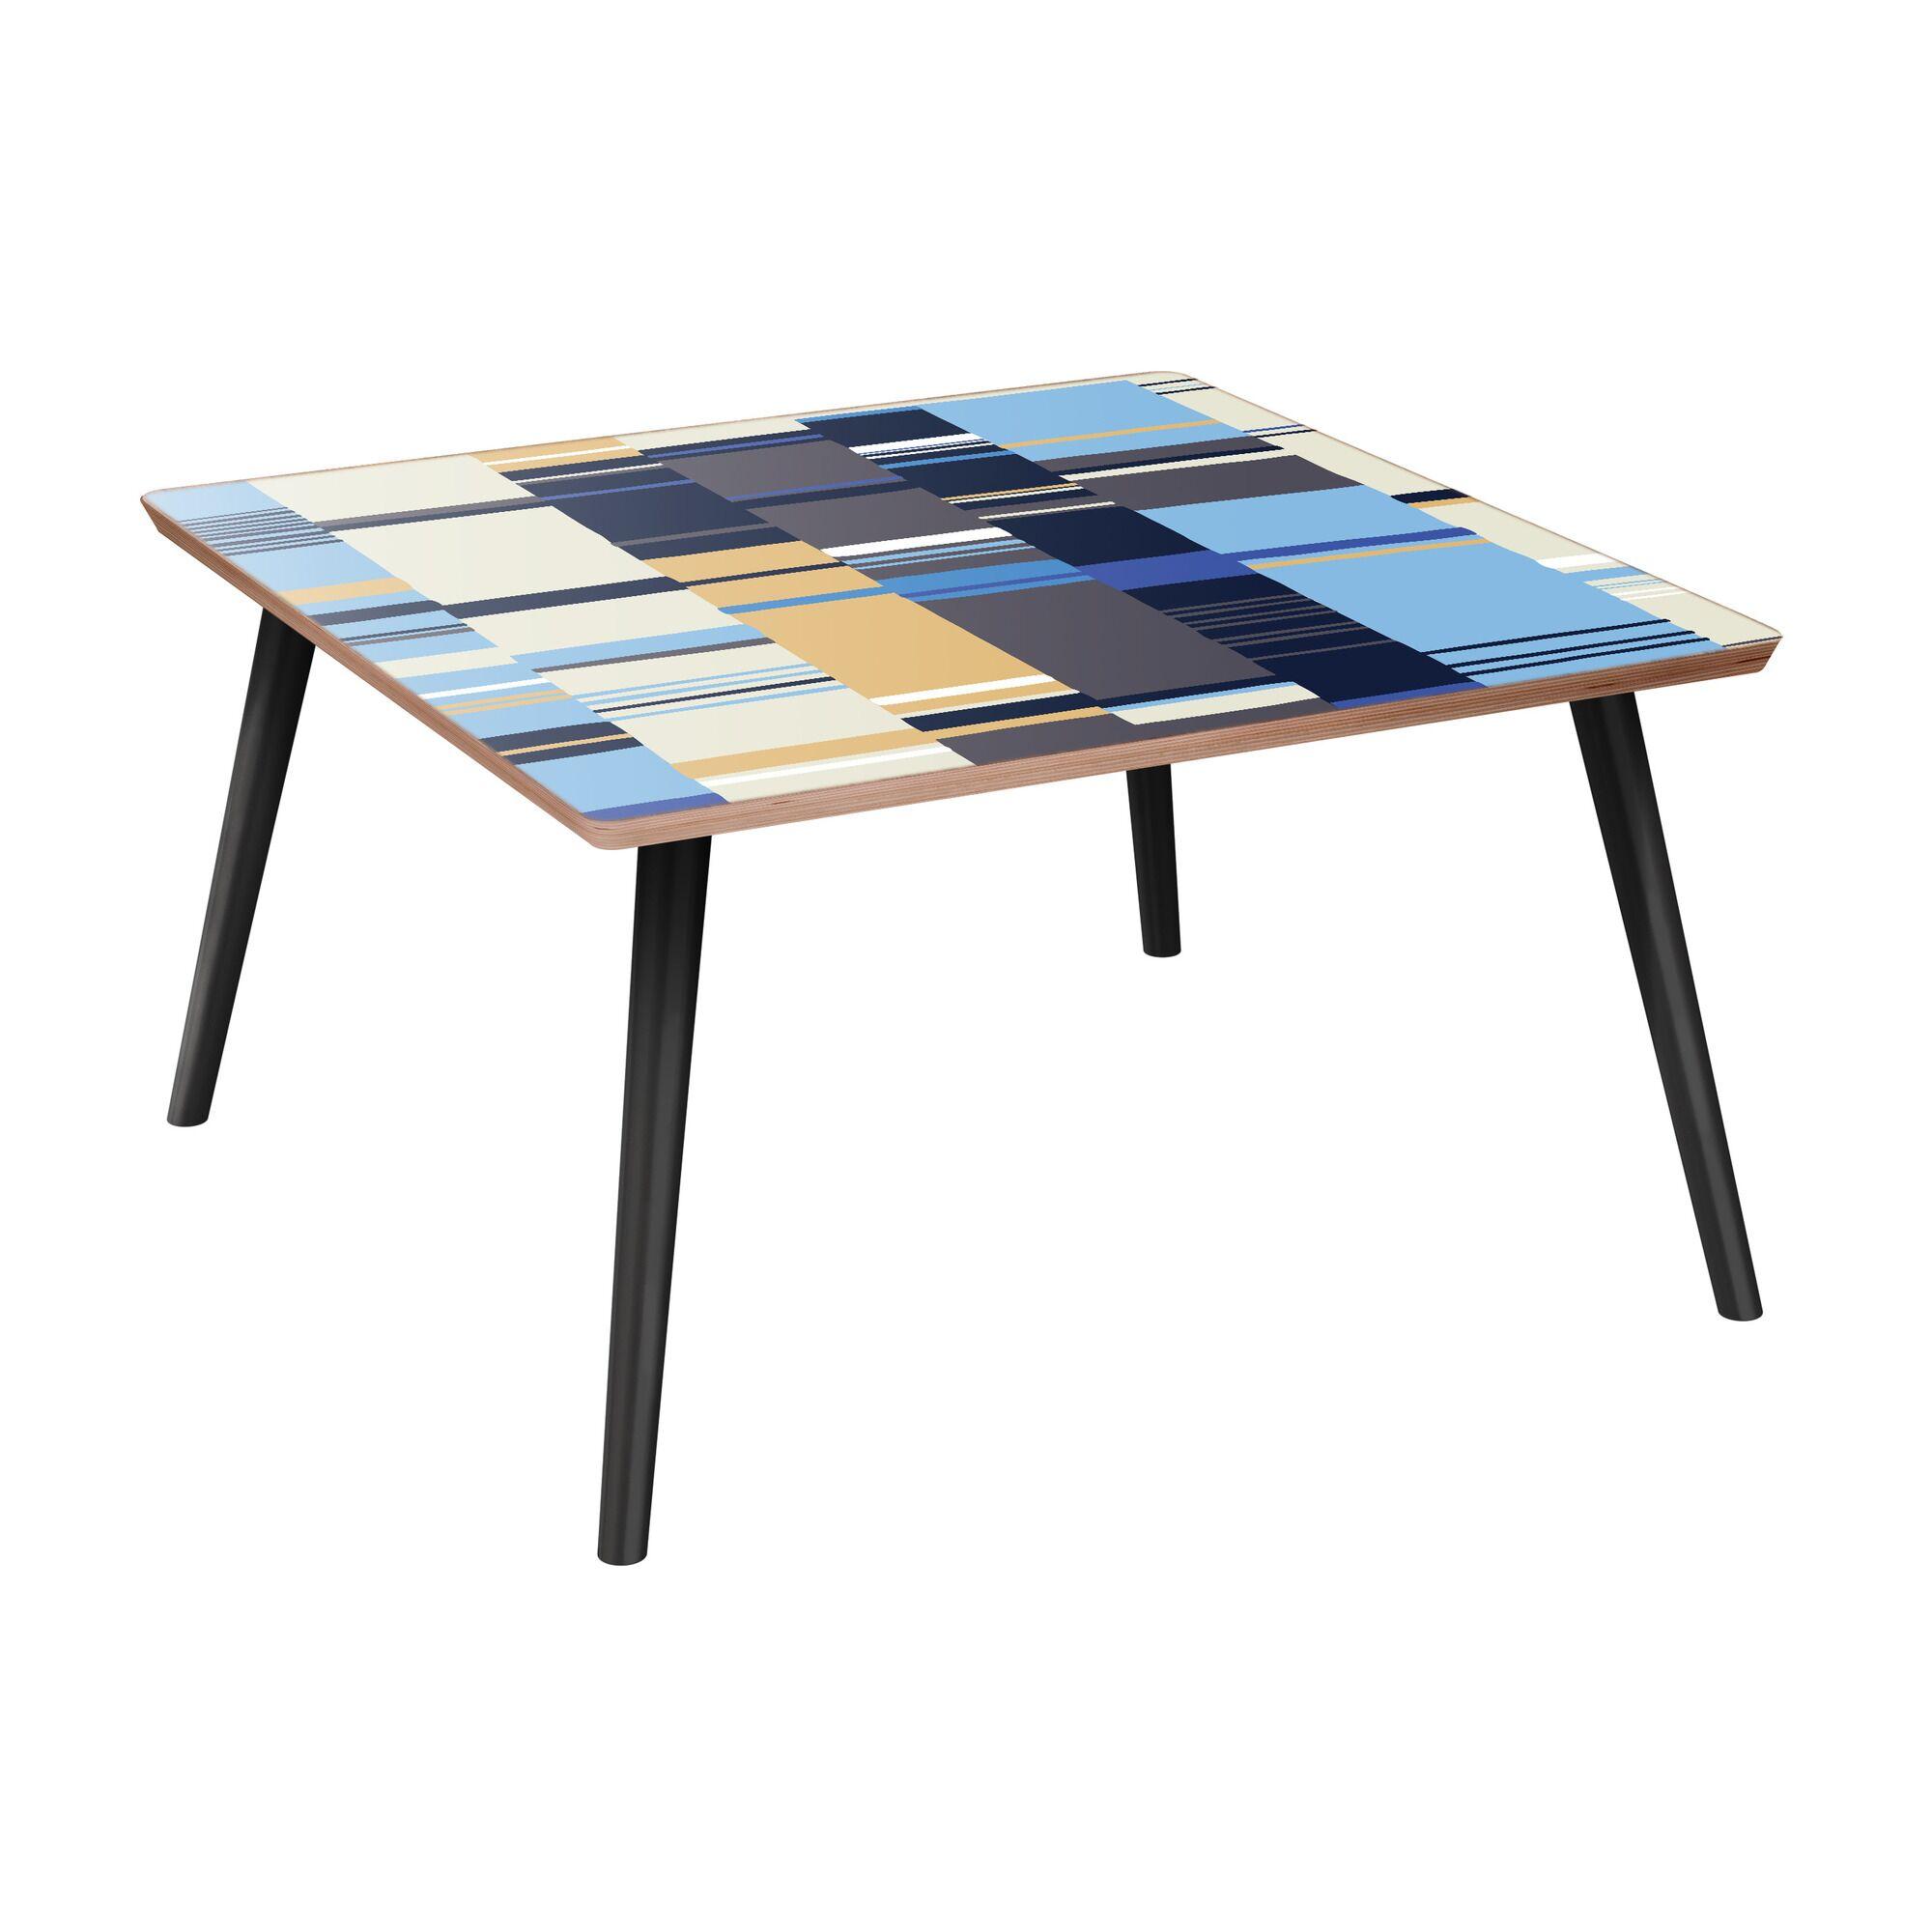 Rangel Coffee Table Table Base Color: Black, Table Top Color: Walnut